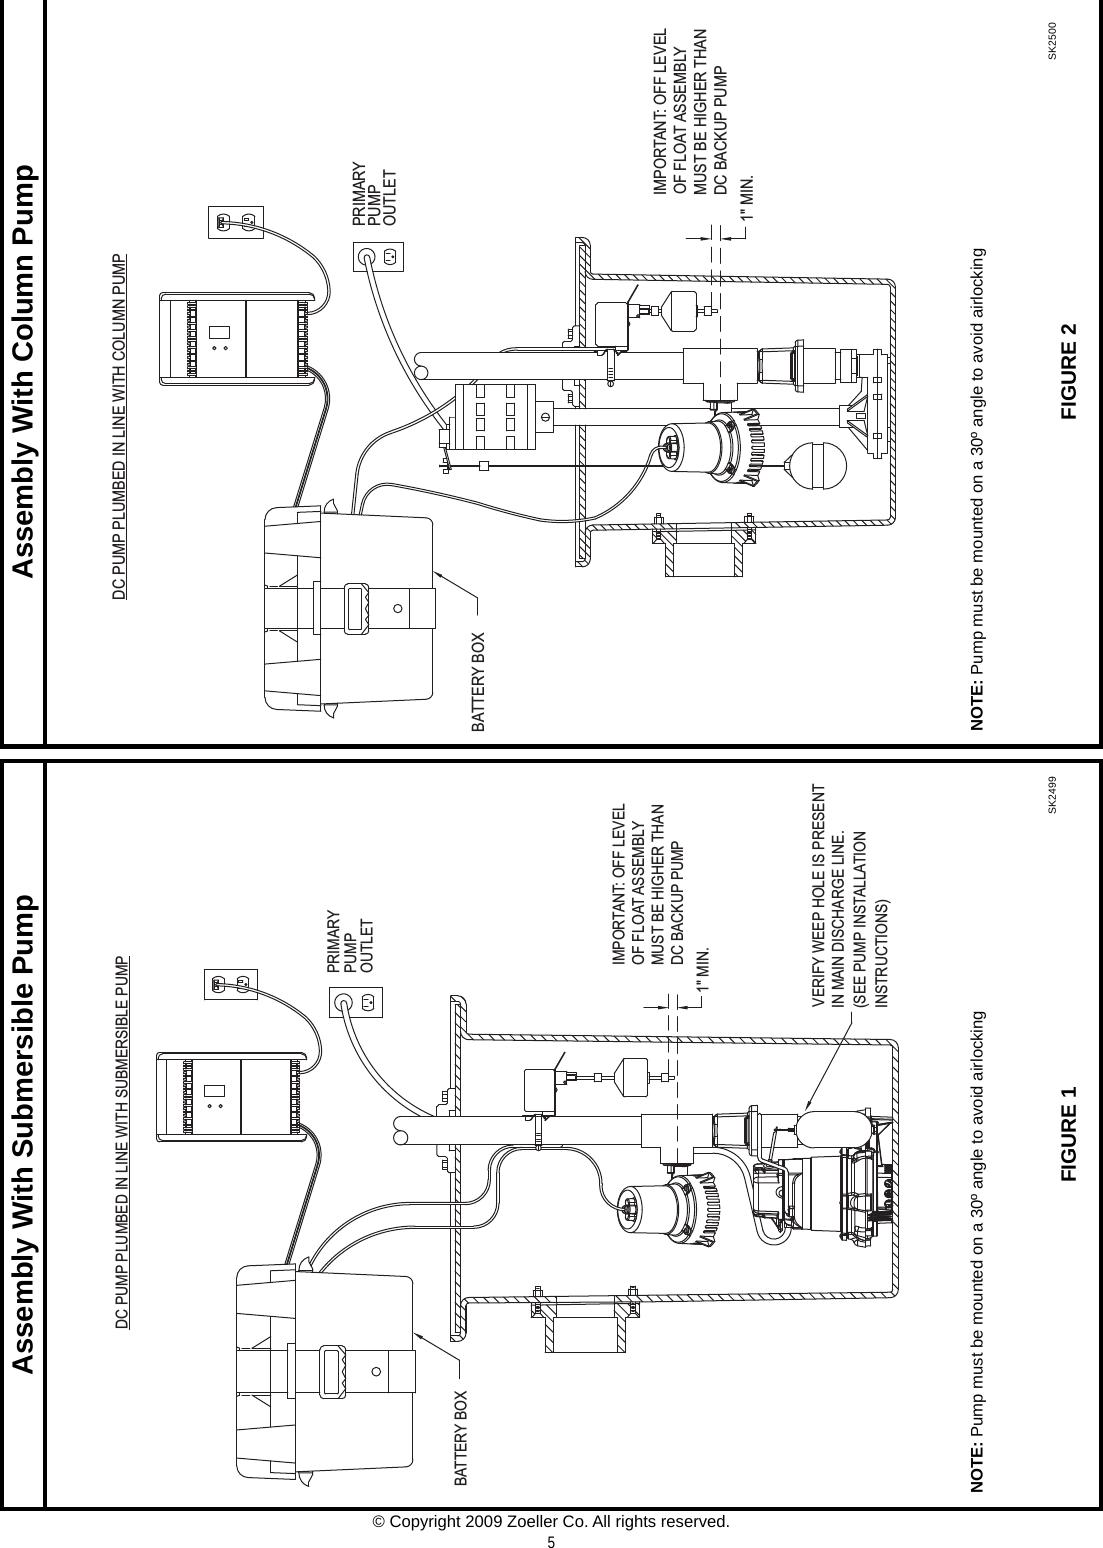 537026 1 Zoeller 507 Basement Sentry System Installation